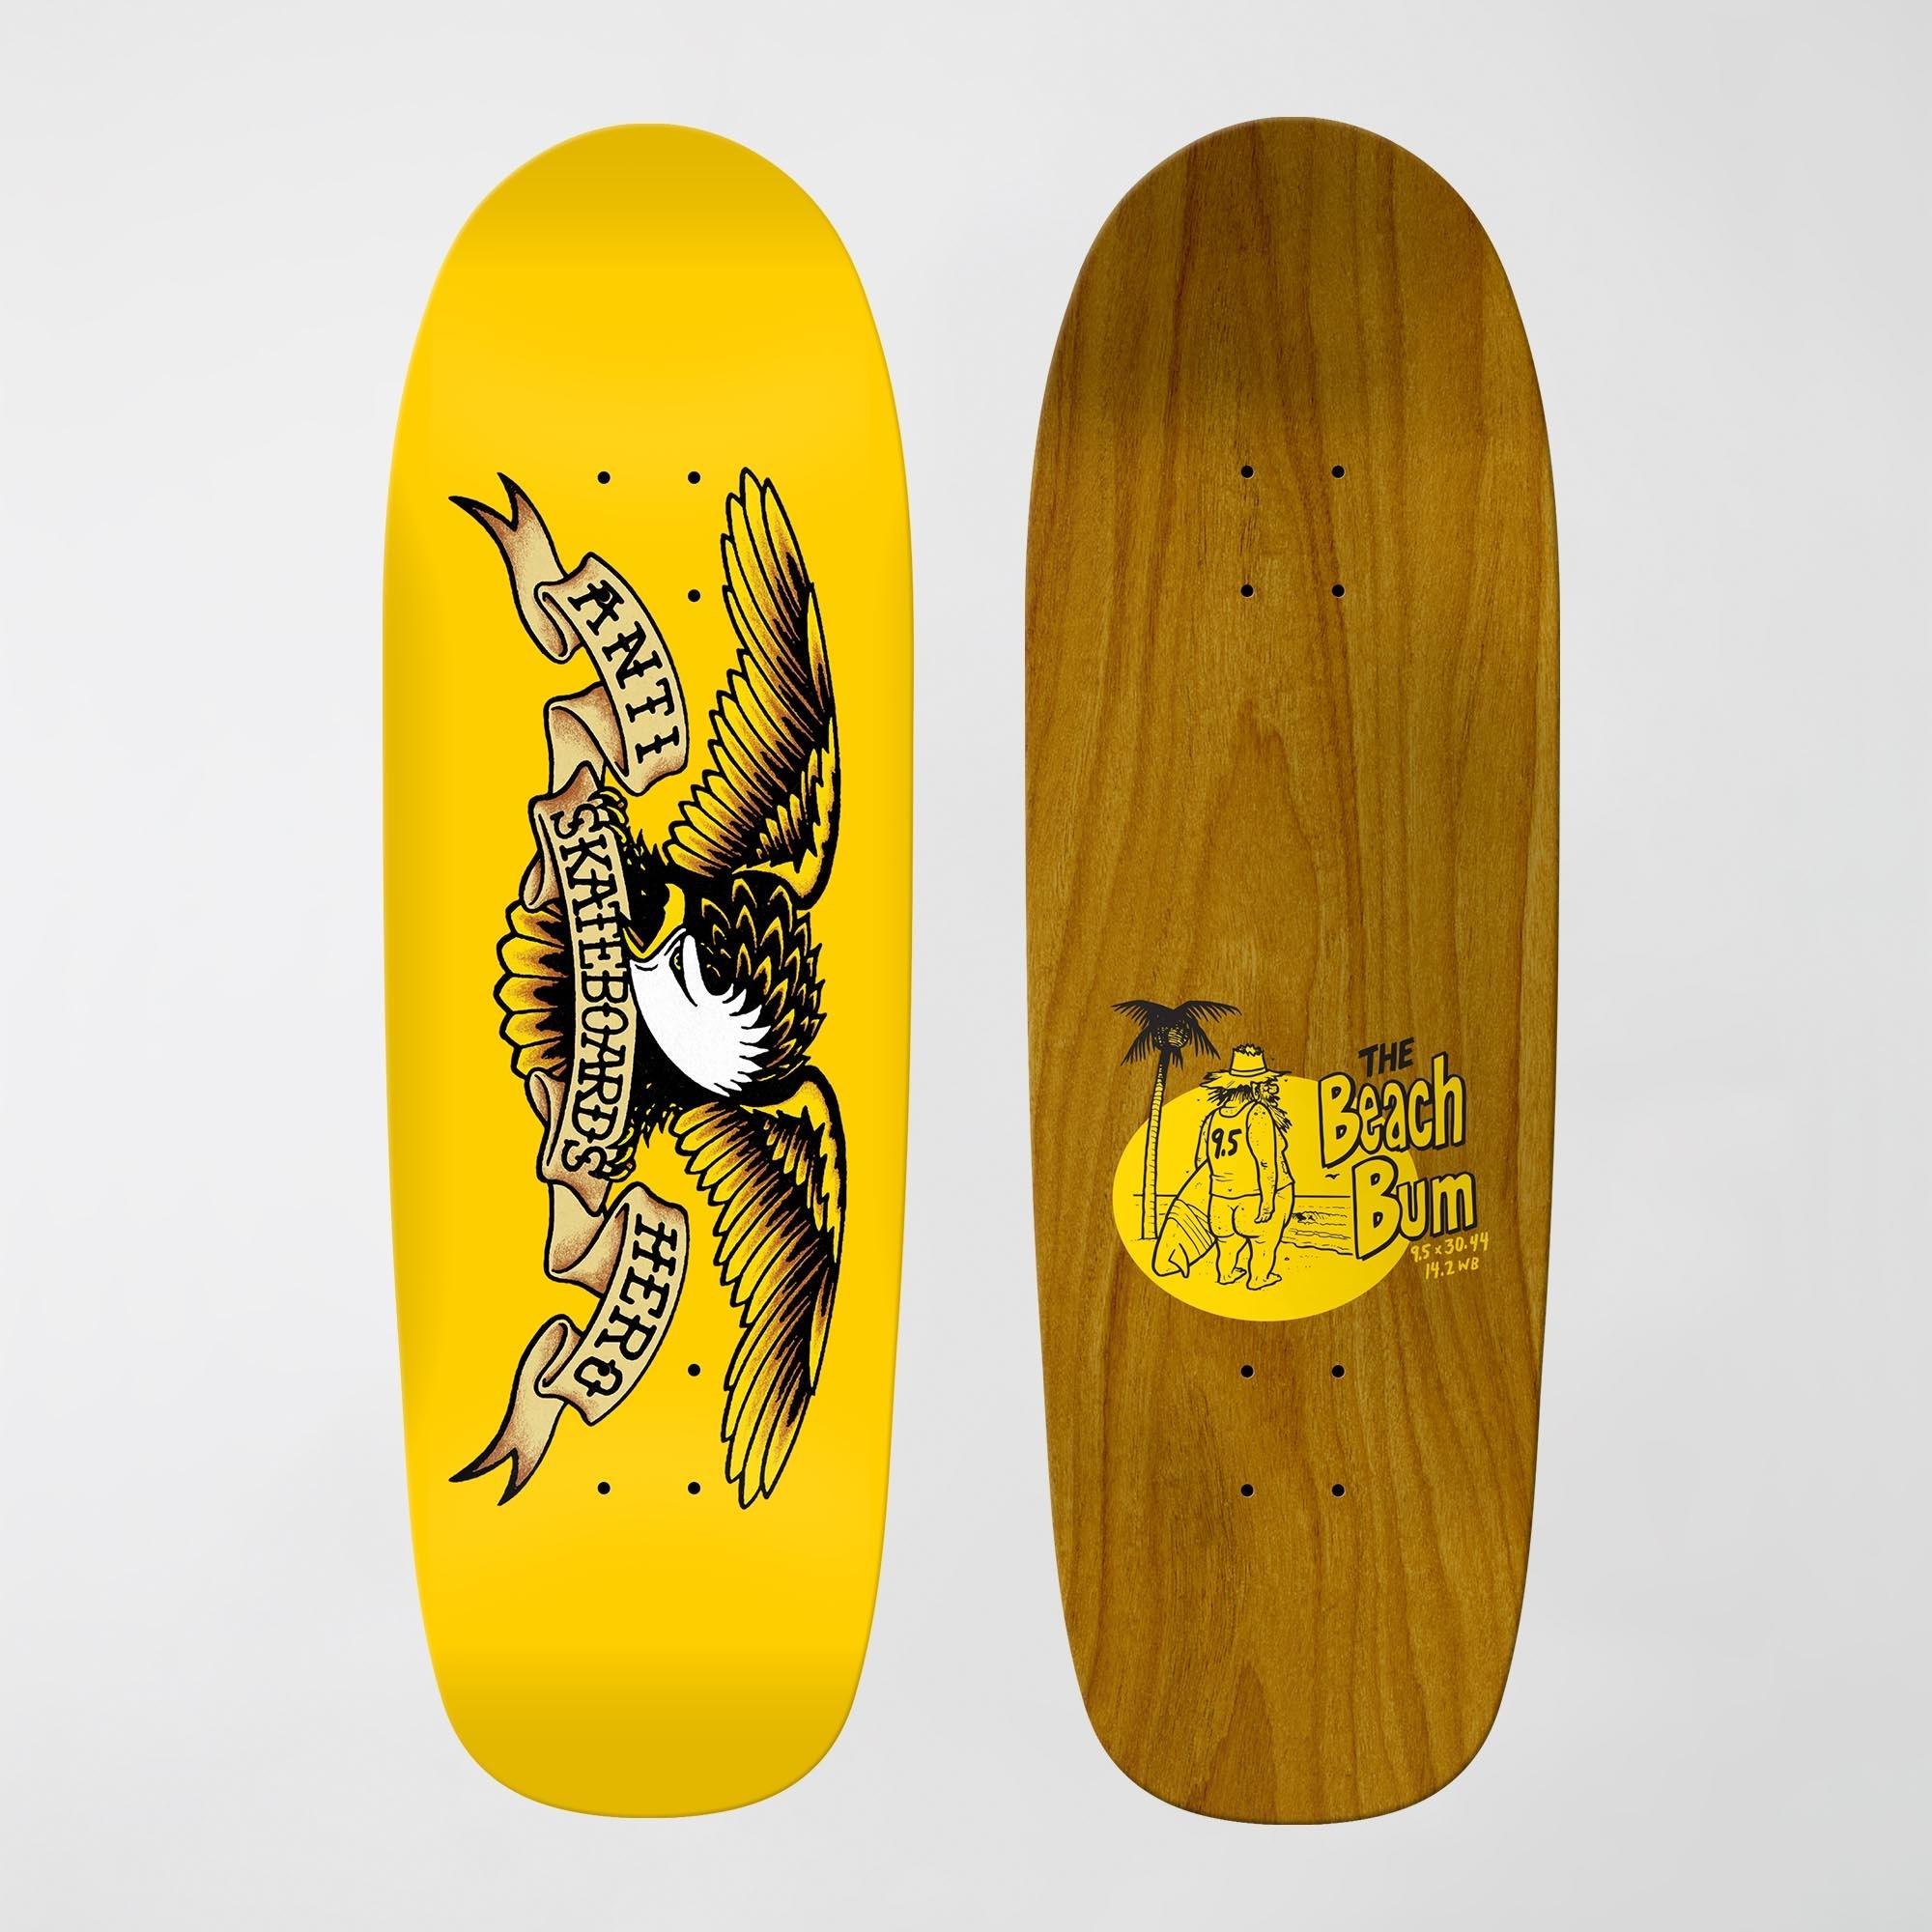 anti-hero shaped eagle beach bum 9.55 deck